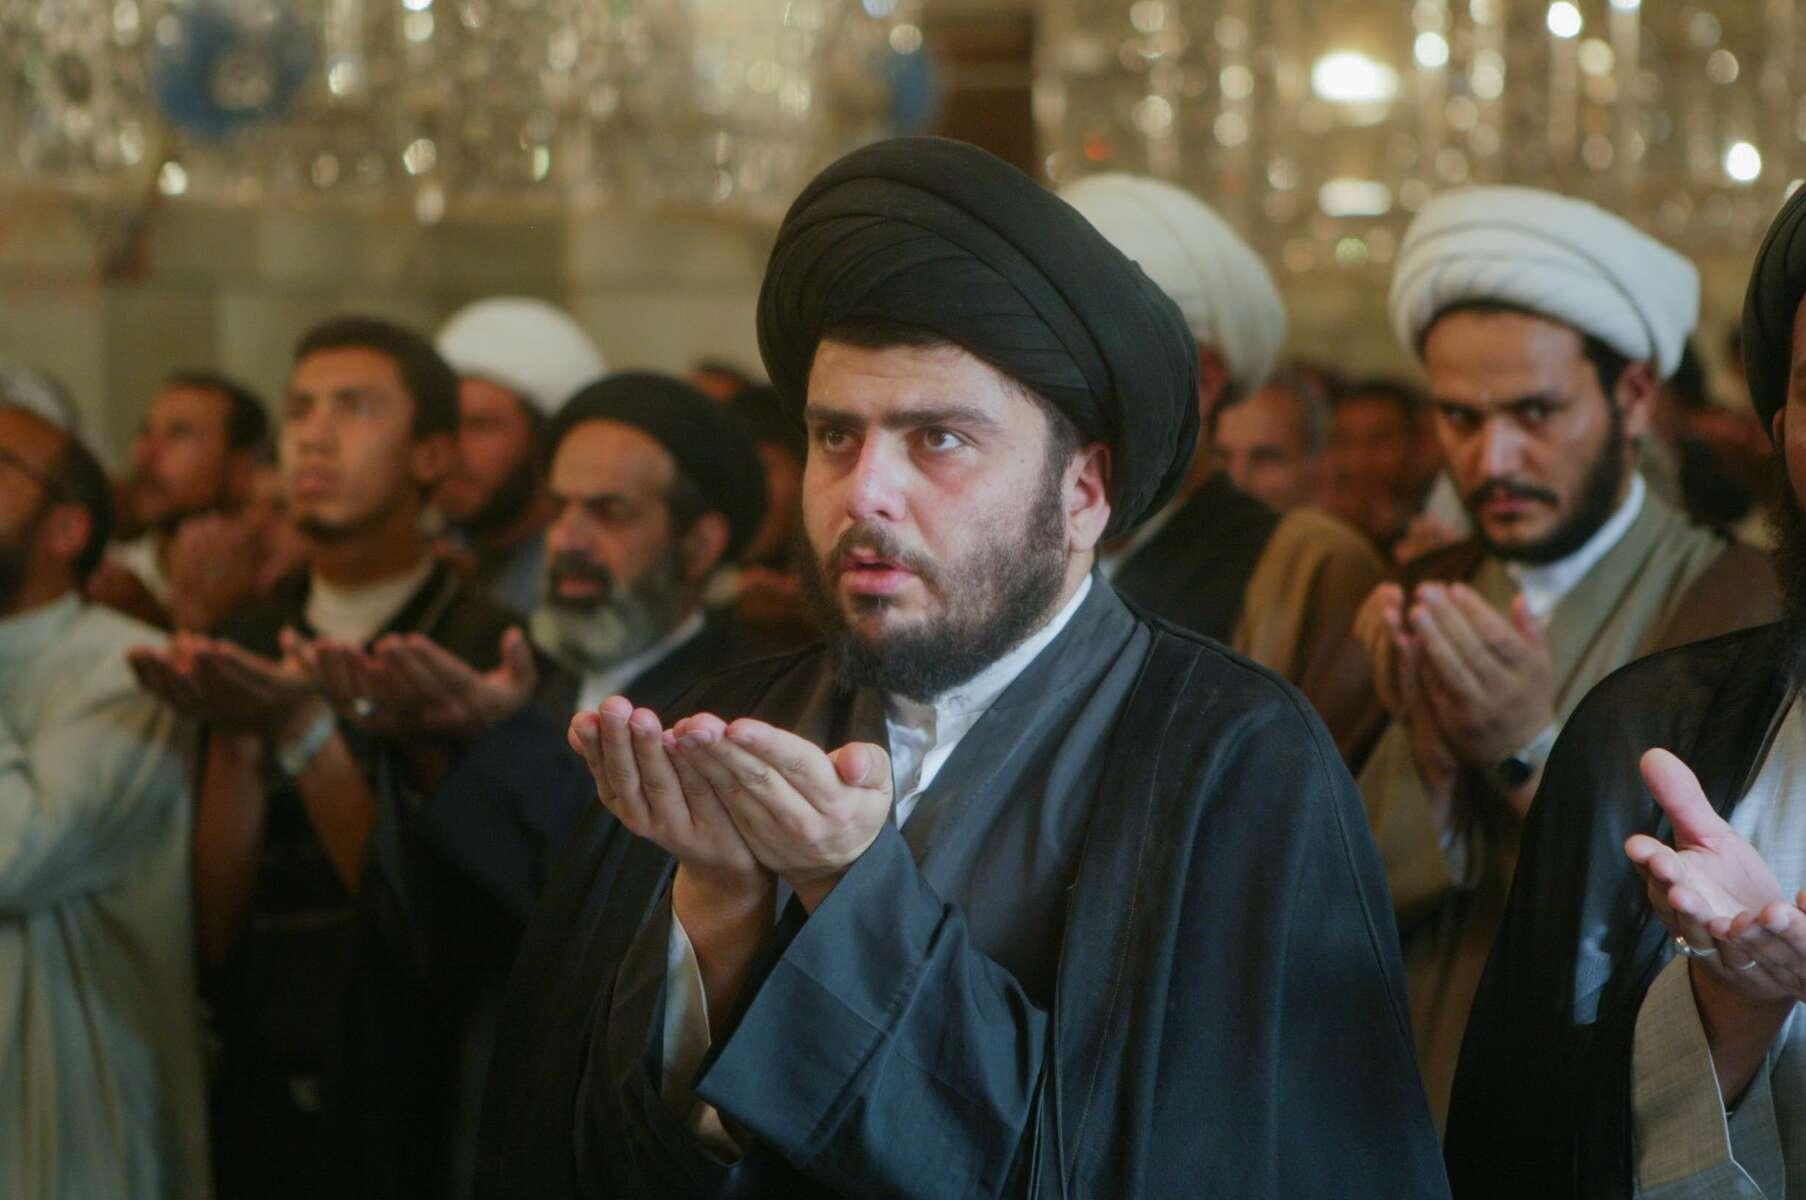 Najaf, Iraq - Muqtada al-Sadr (2nd from right) a Shite clerical leader who  has tremendous influence among the predominantly Shia Islamic community of Iraq,  prayers at  the Imam Ali Holy Shrine.  - Ozier Muhammad / NYT